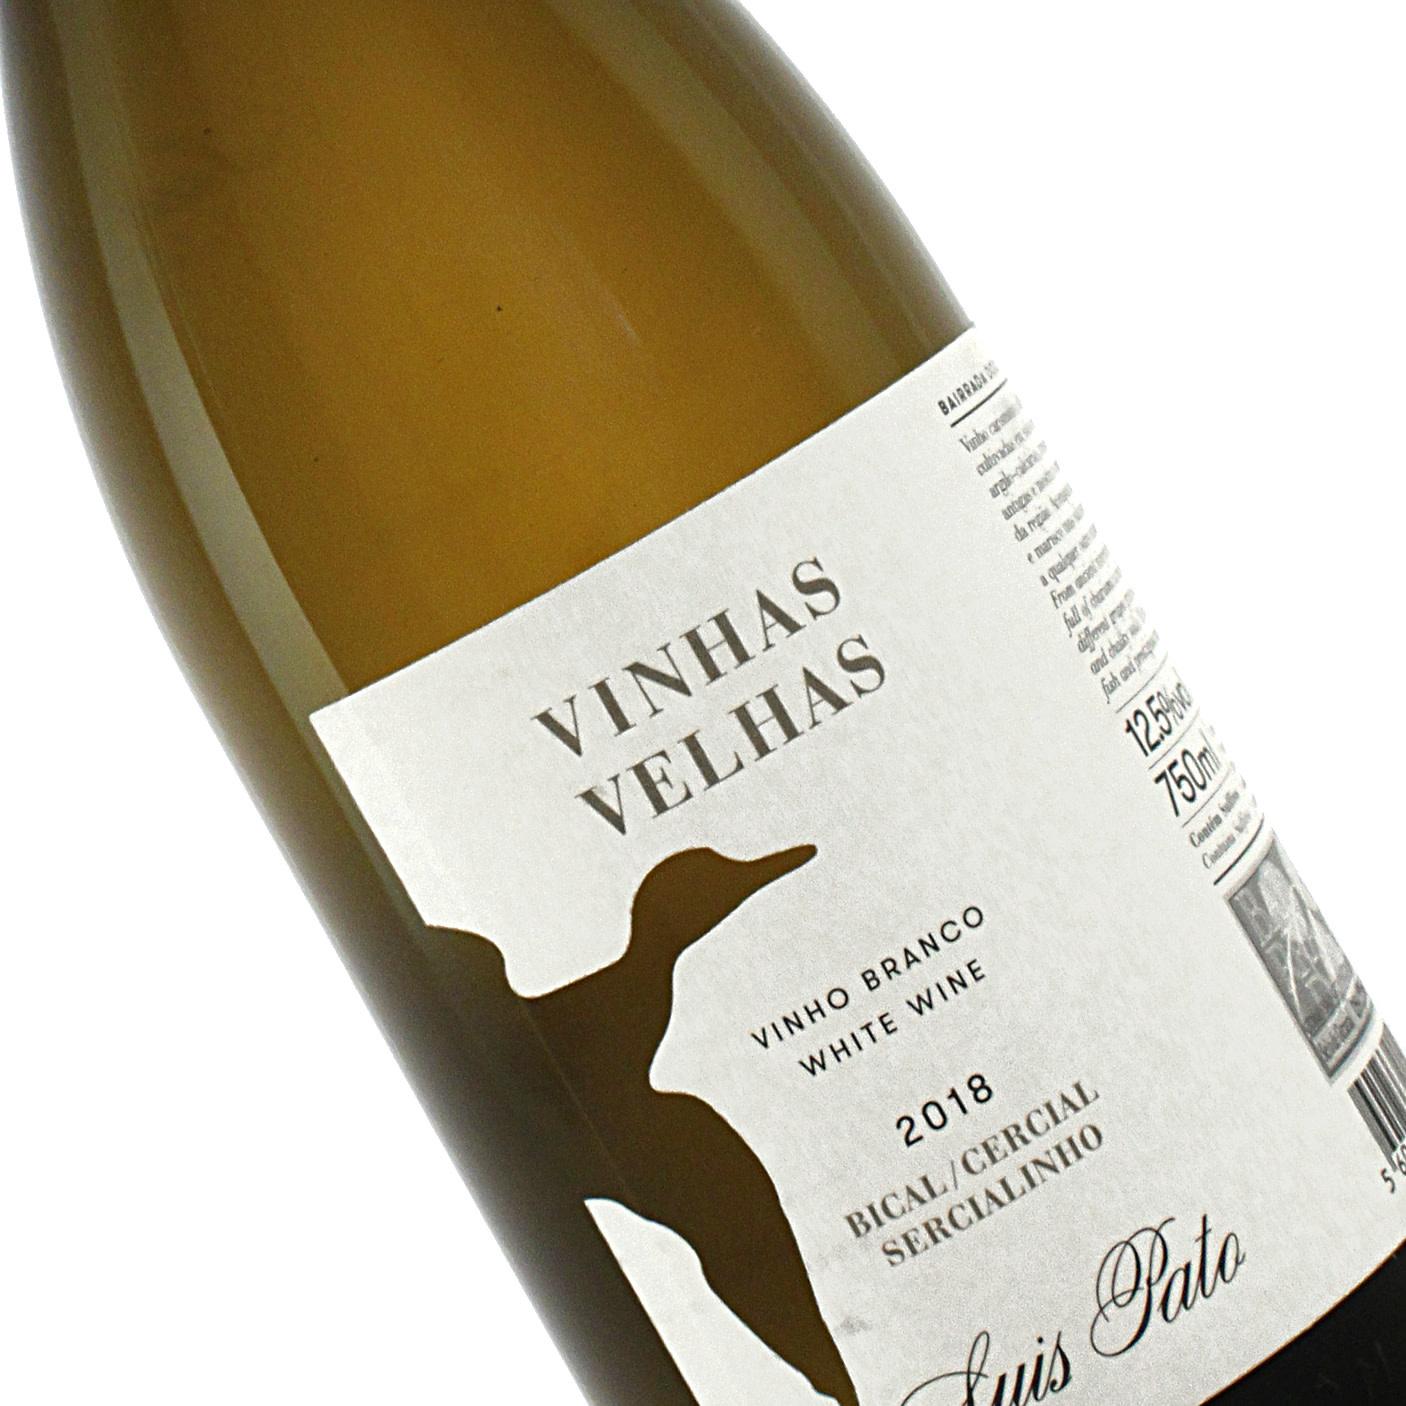 Luis Pato 2019 Vinhas Velhas Vinho Branco, Bairrada Portugal